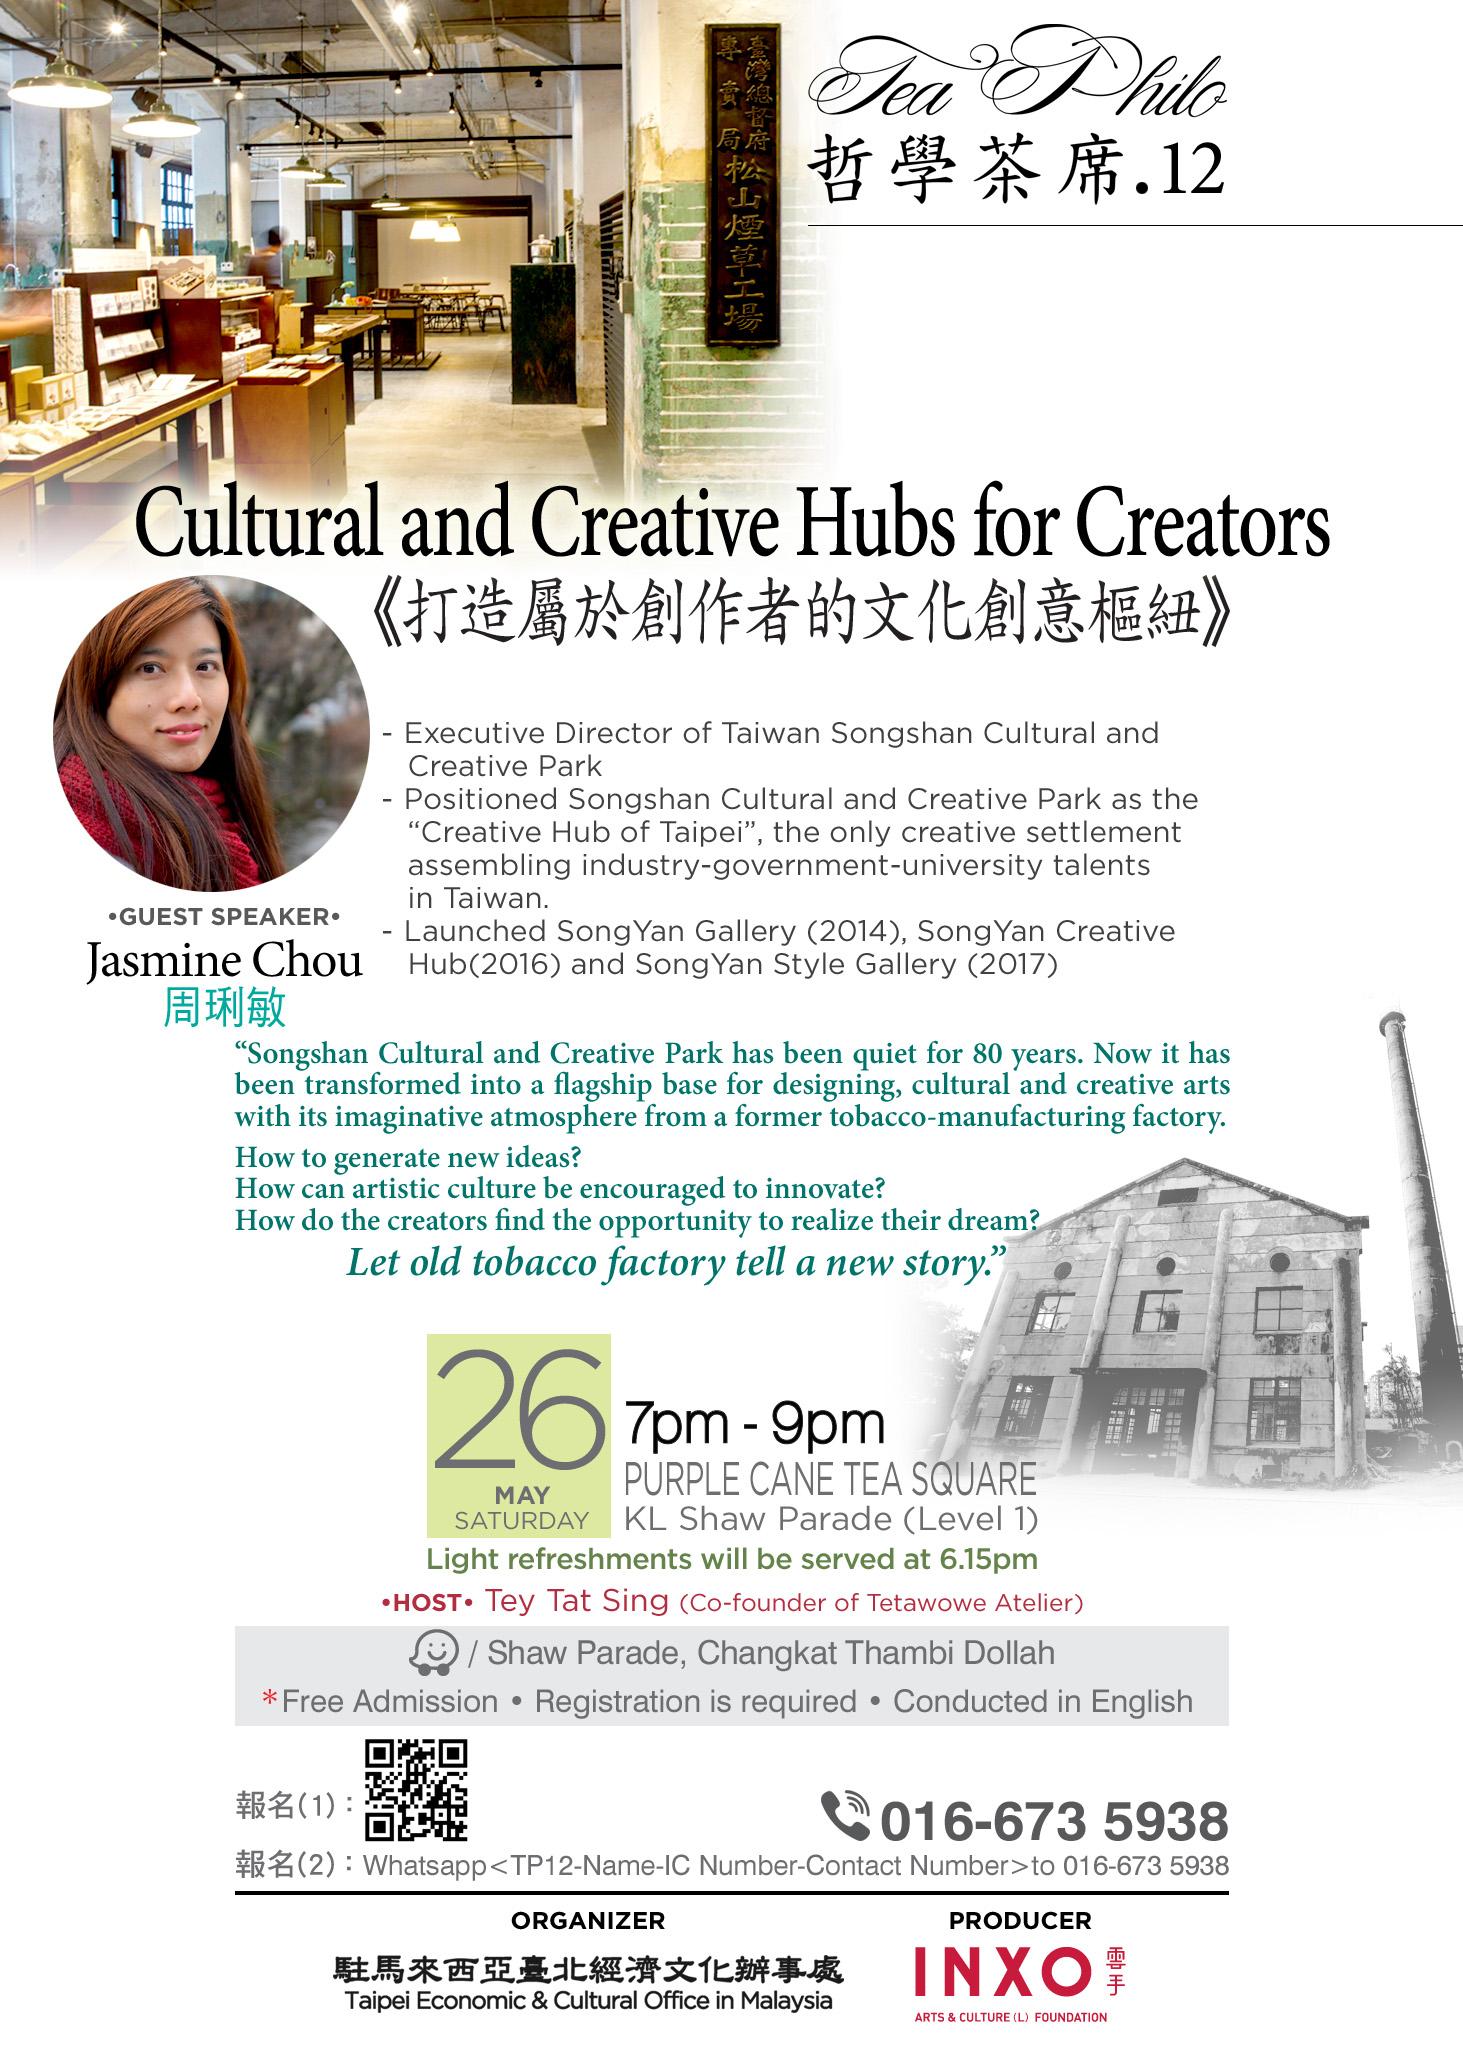 Kuala Lumpur | 'Cultural and Creative Hubs for Creators'